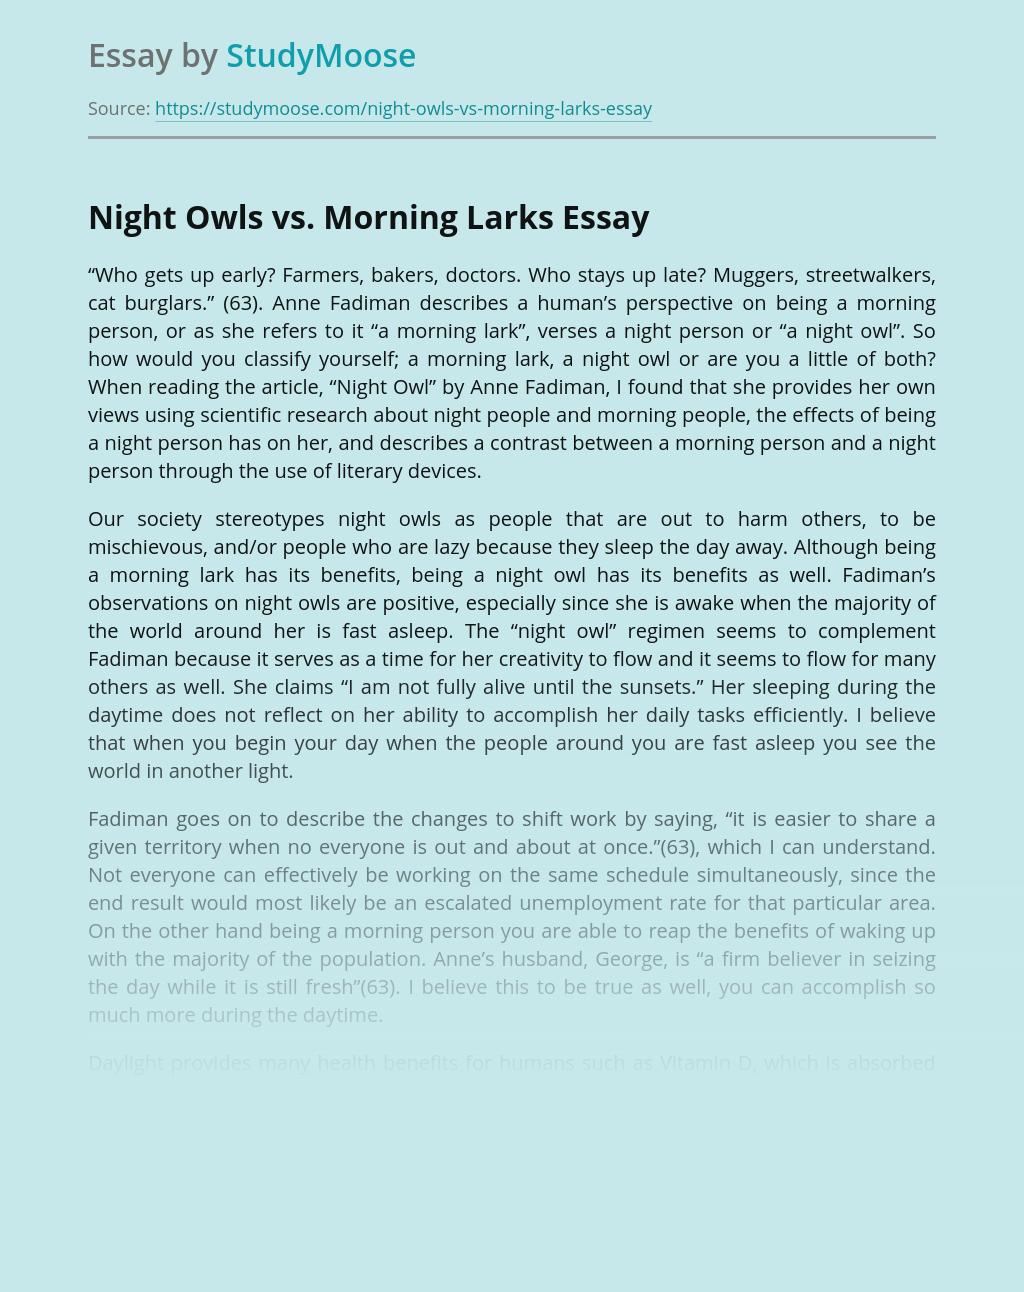 Night Owls vs. Morning Larks